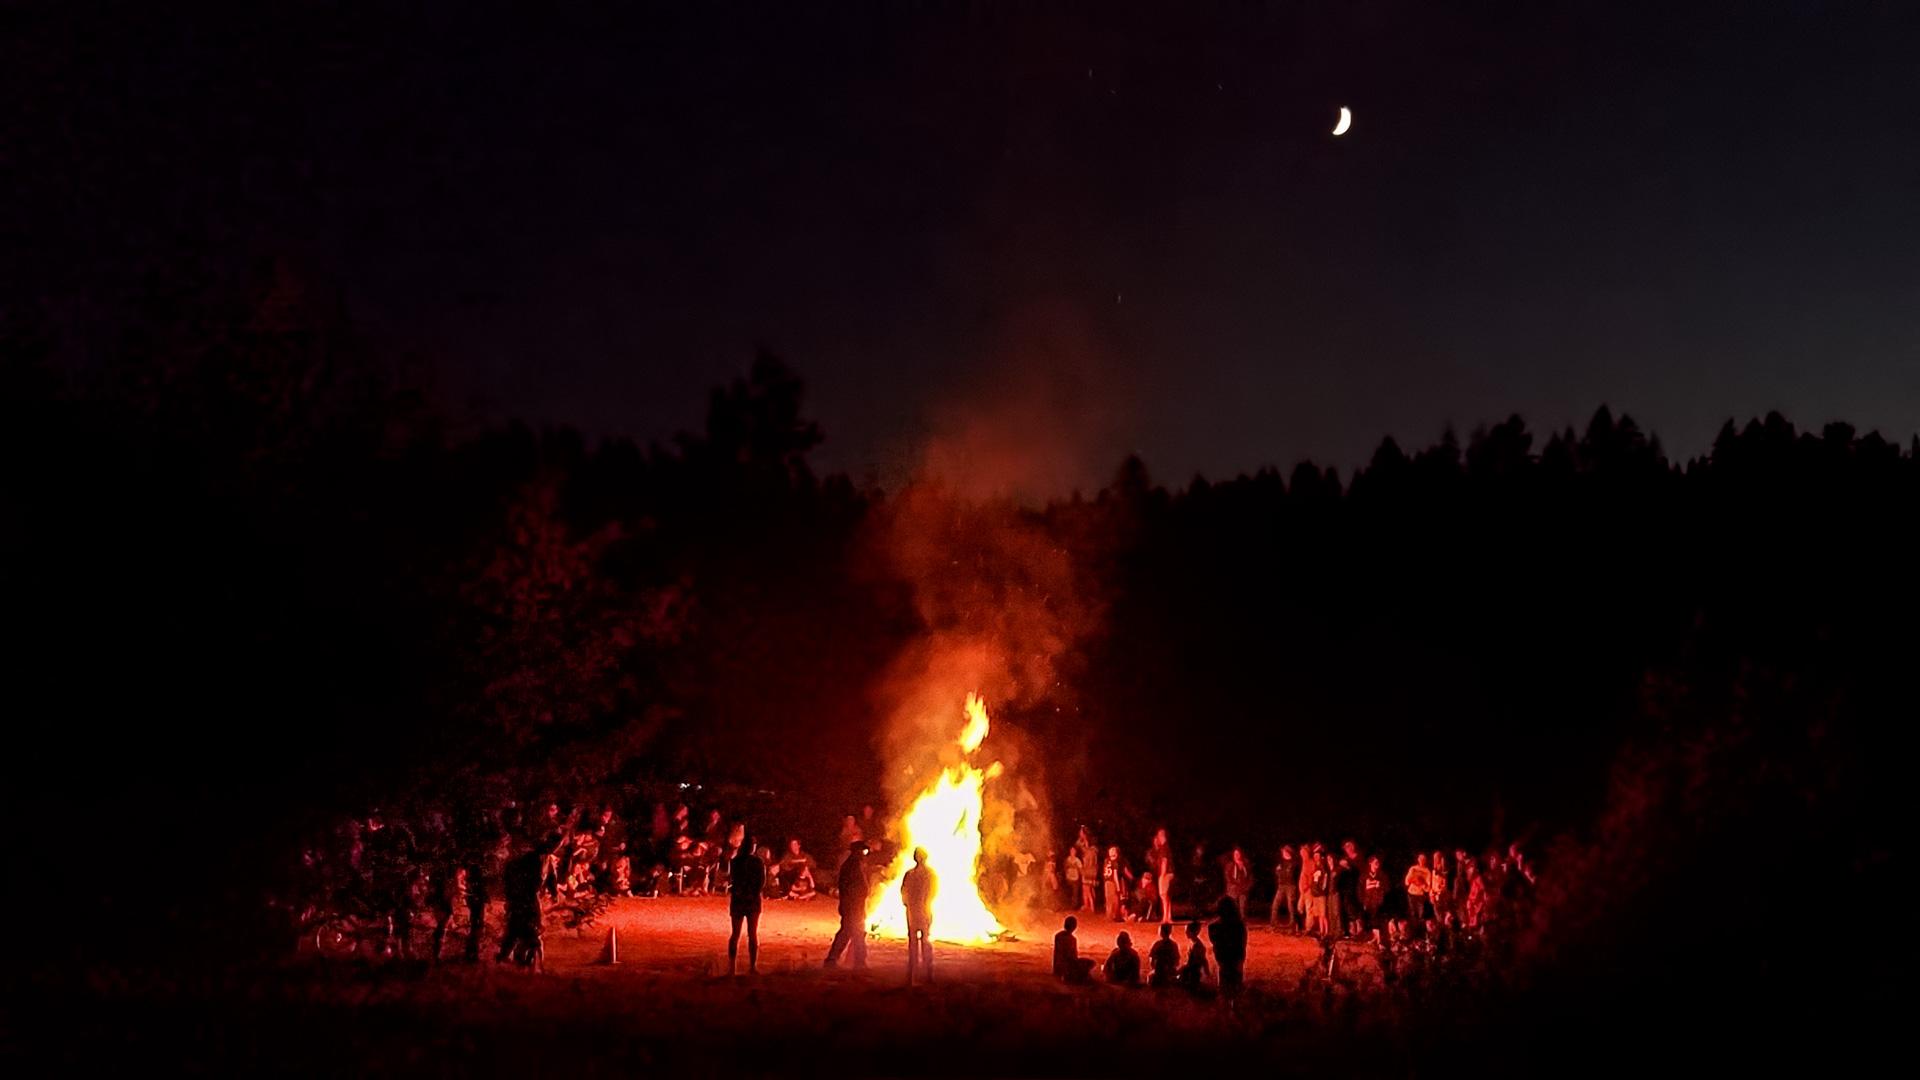 Bonfire-02-Web.jpg